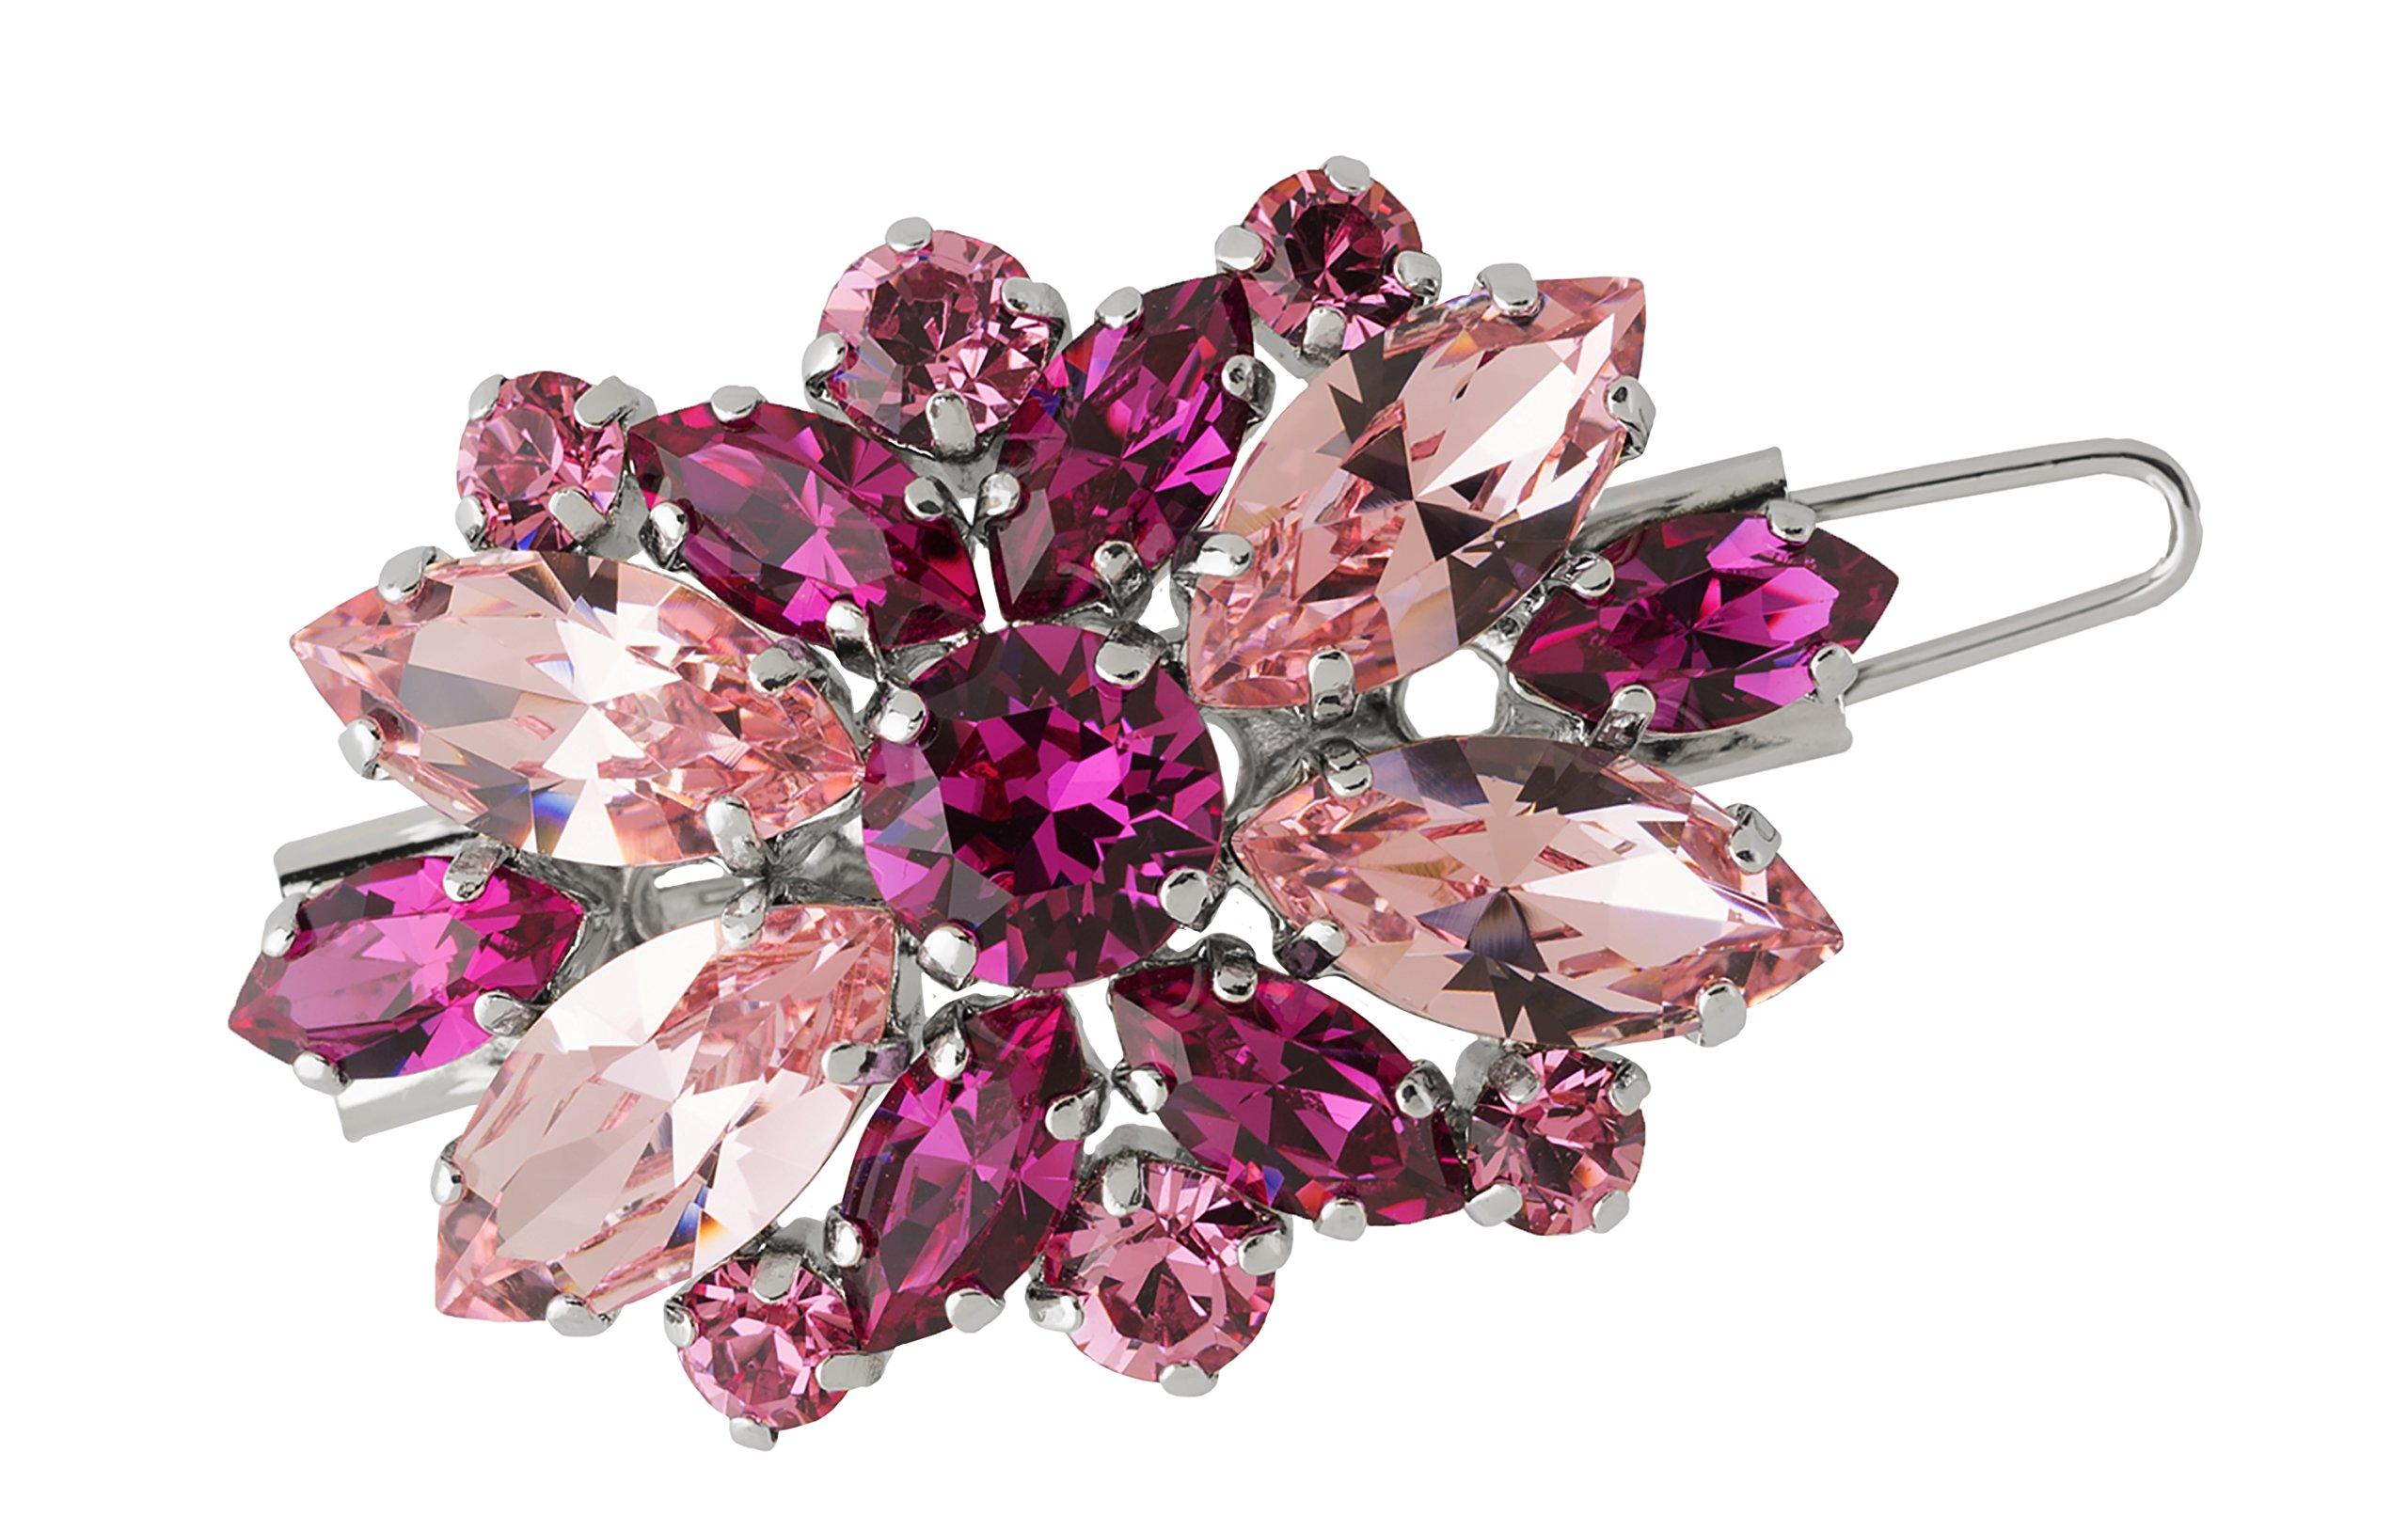 L. Erickson Countess Crystal Tige Boule Barrette - Light Rose/Fuchsia/Silver